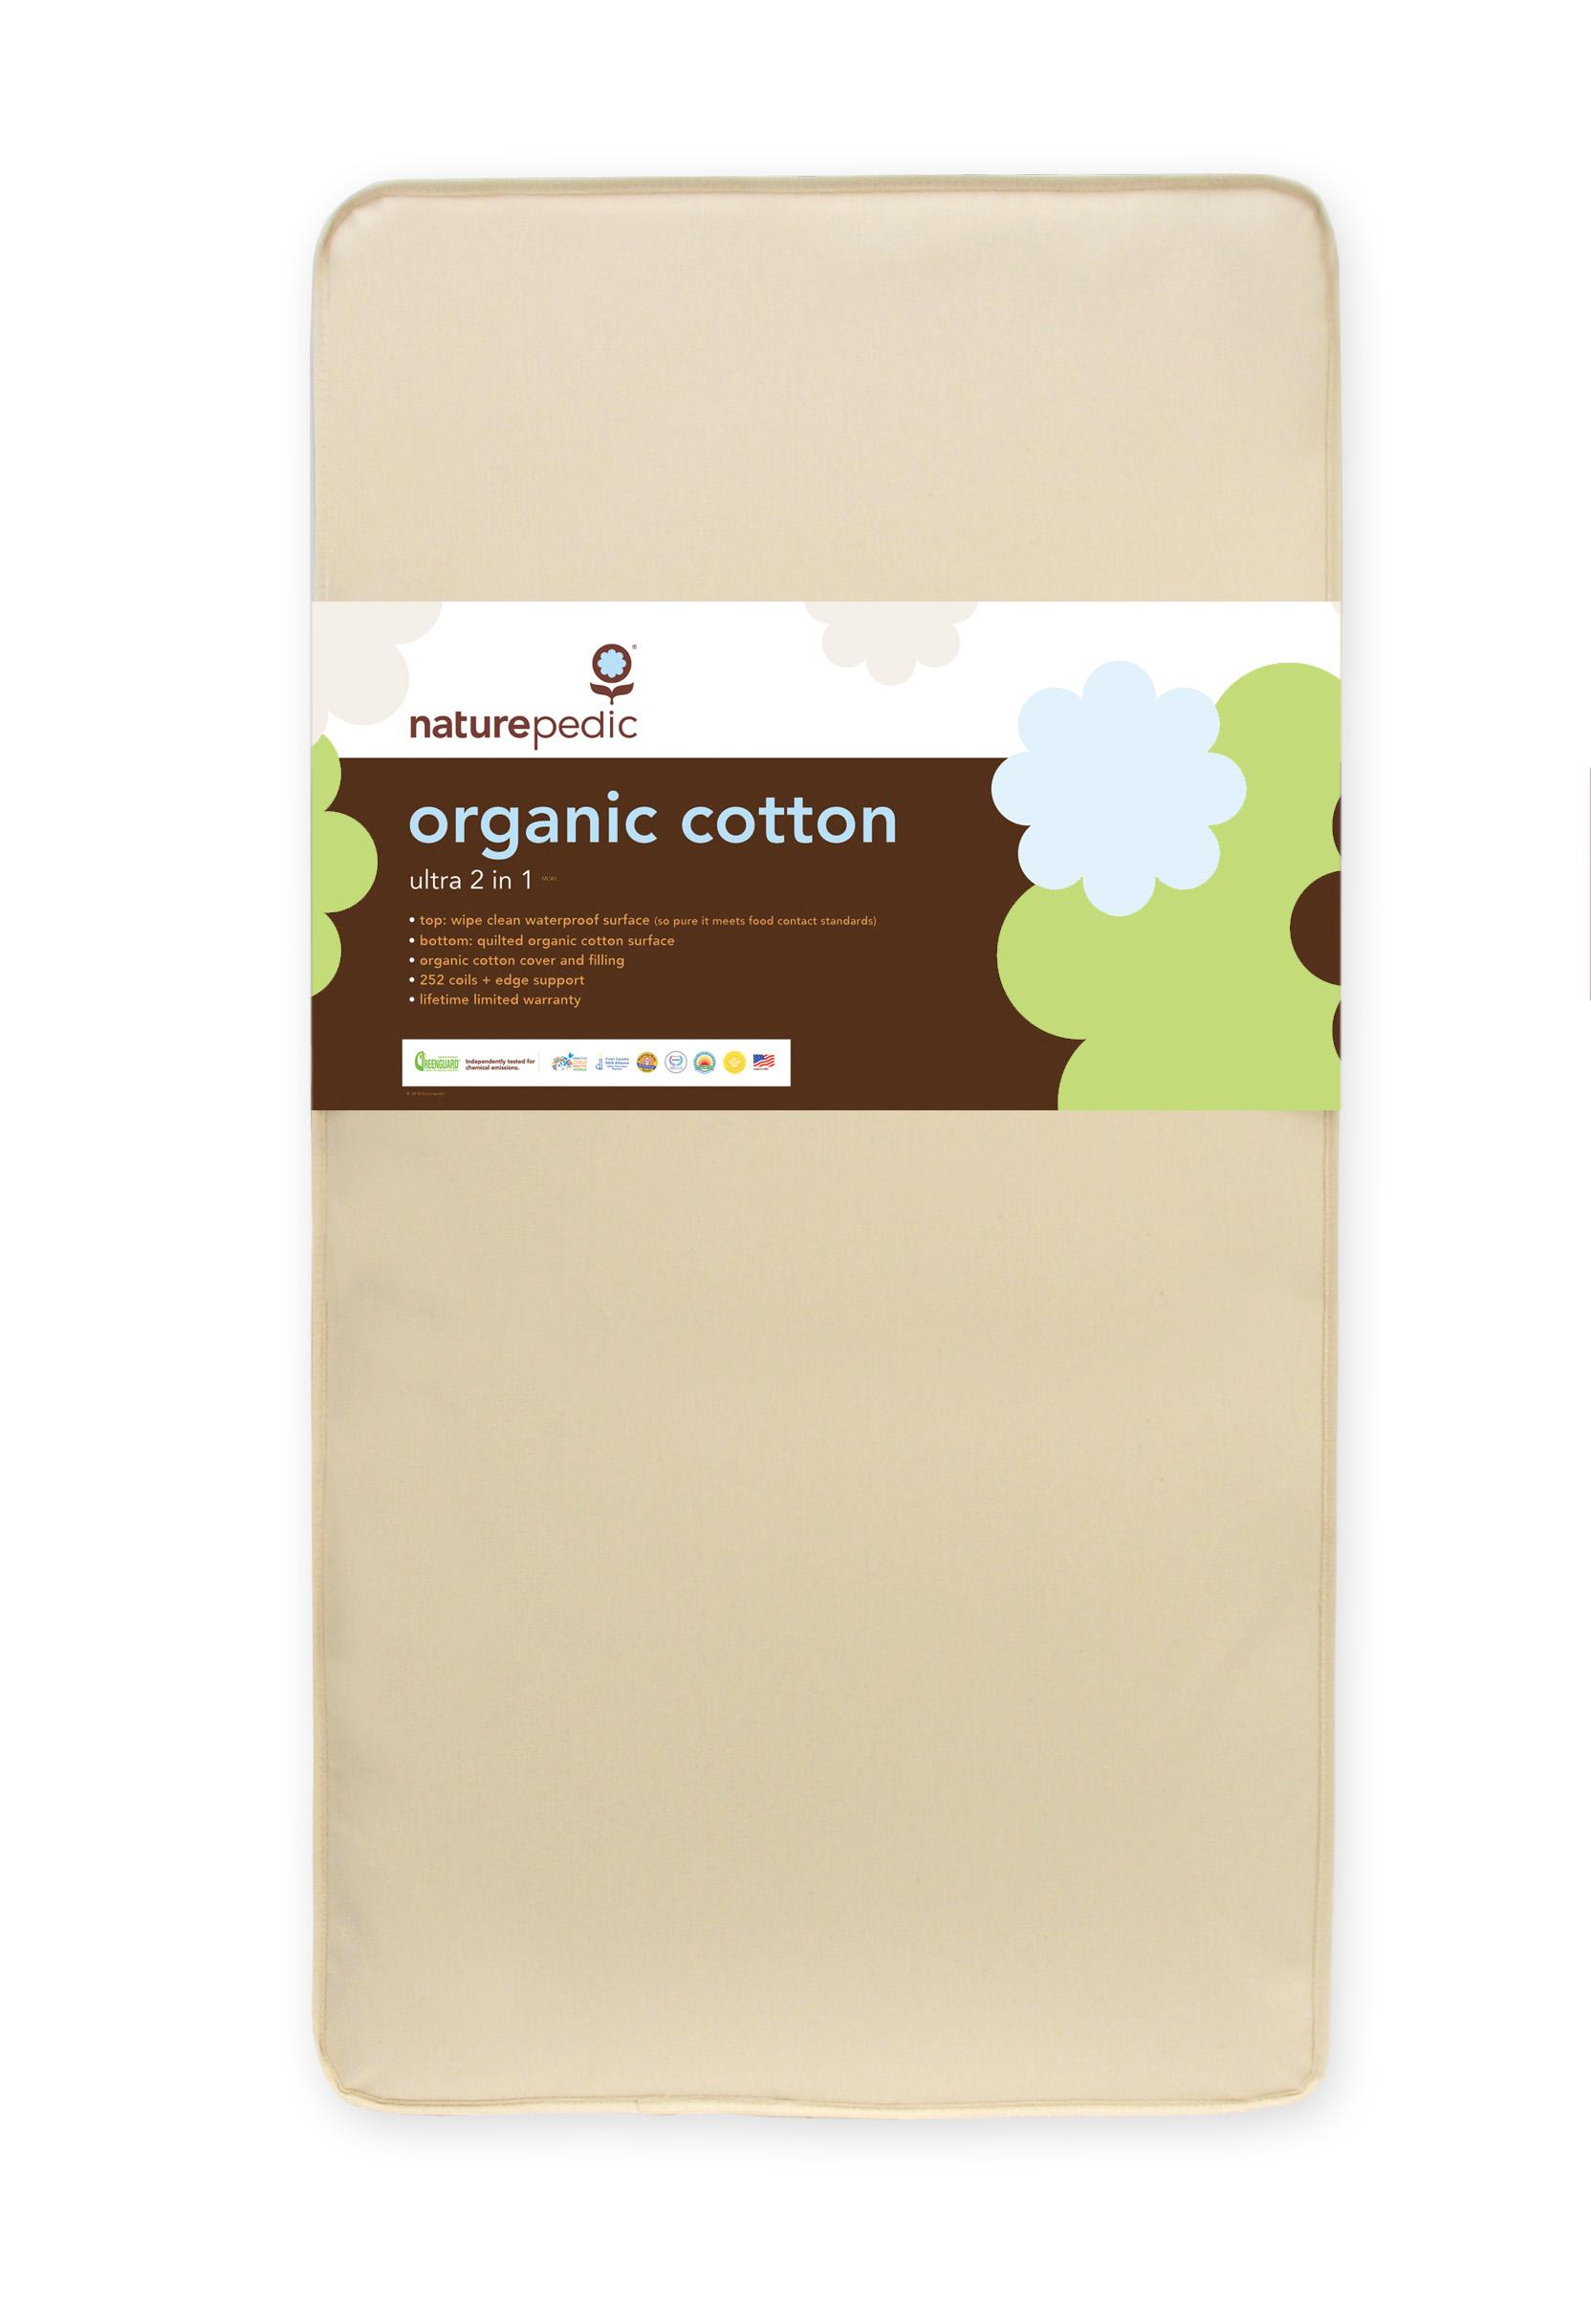 Naturepedic 2 In 1 Organic Cotton Ultra Crib Mattress Mc45